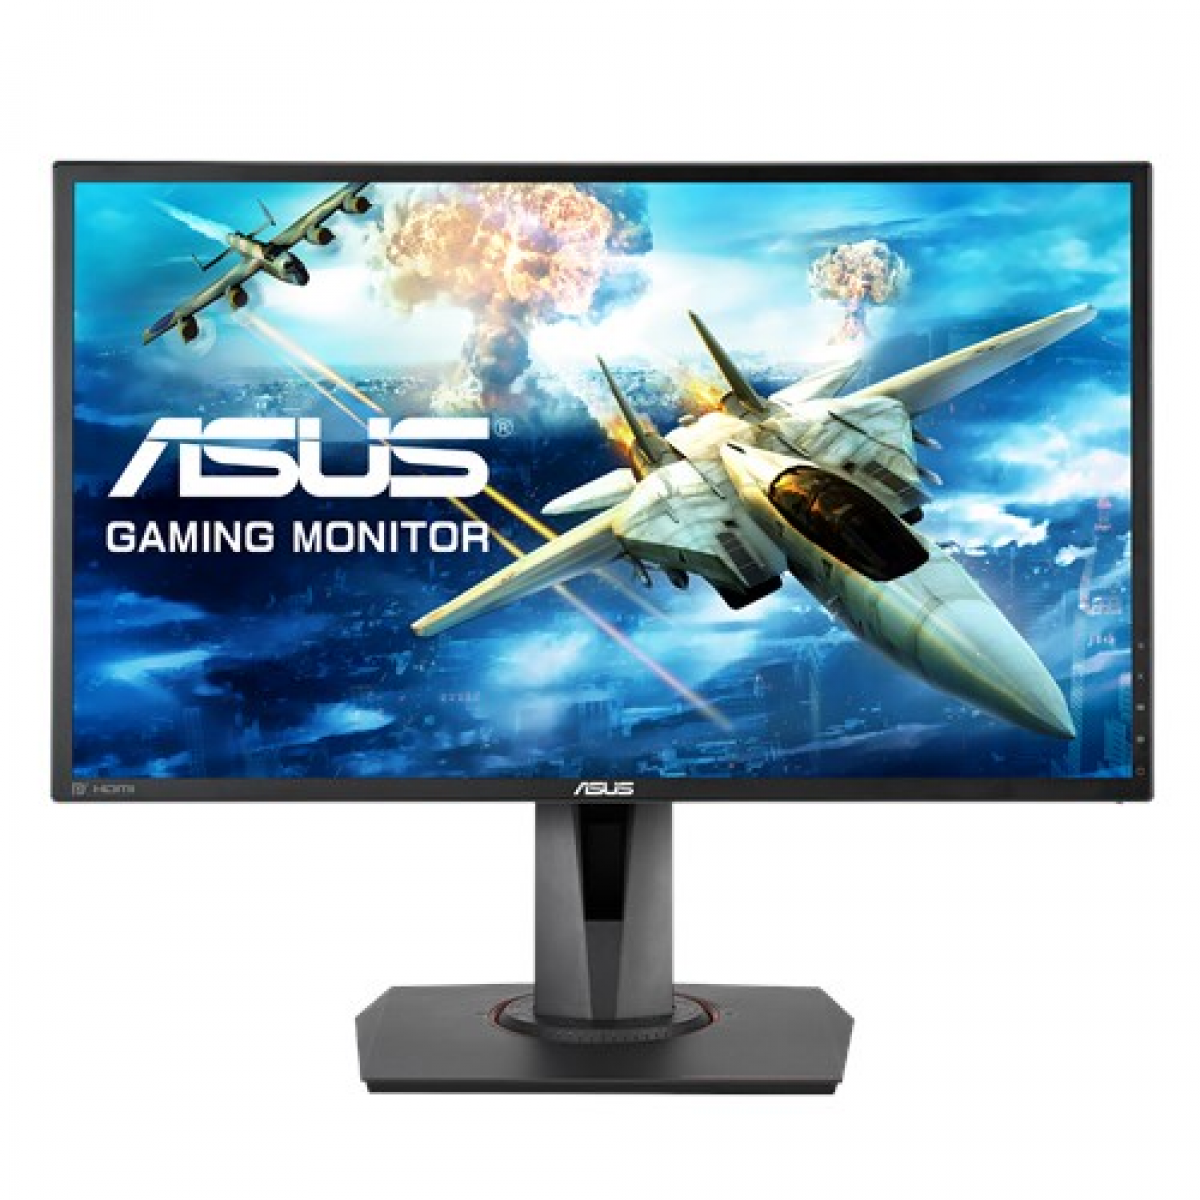 Monitor Gamer Asus 24 Pol, Full HD, 144Hz, 1ms, AMD FreeSync, MG248QR